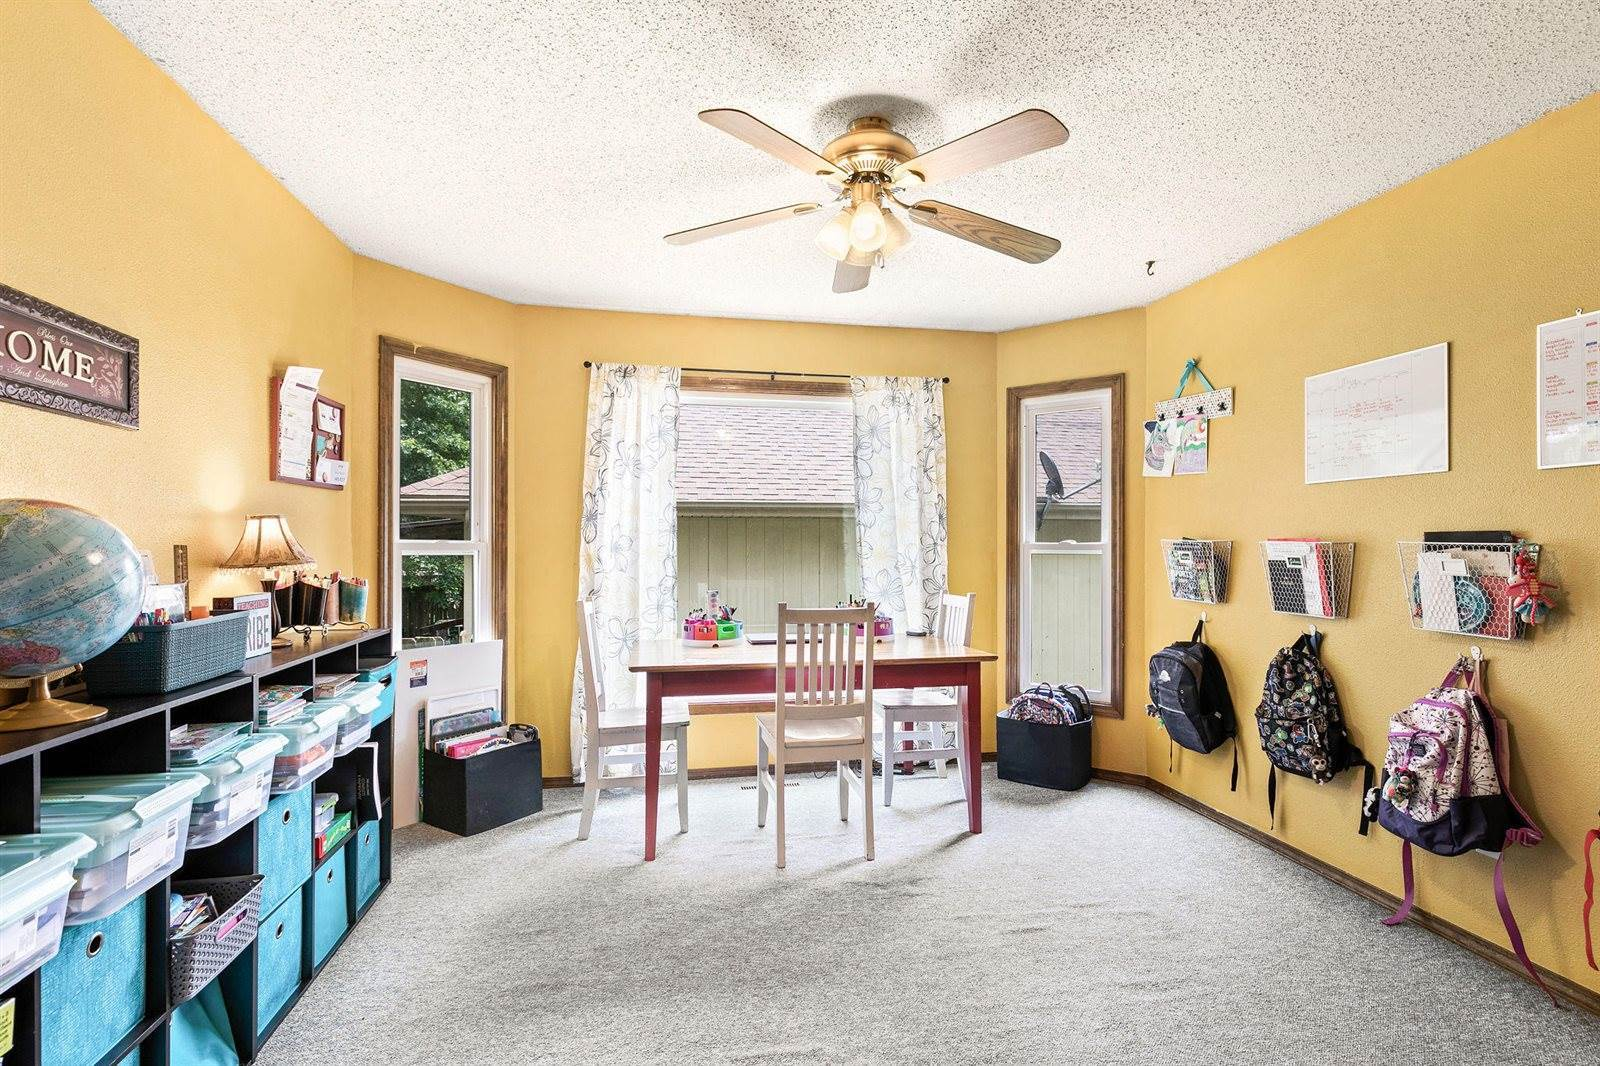 2503 North Honeysuckle Way, Springfield, MO 65802